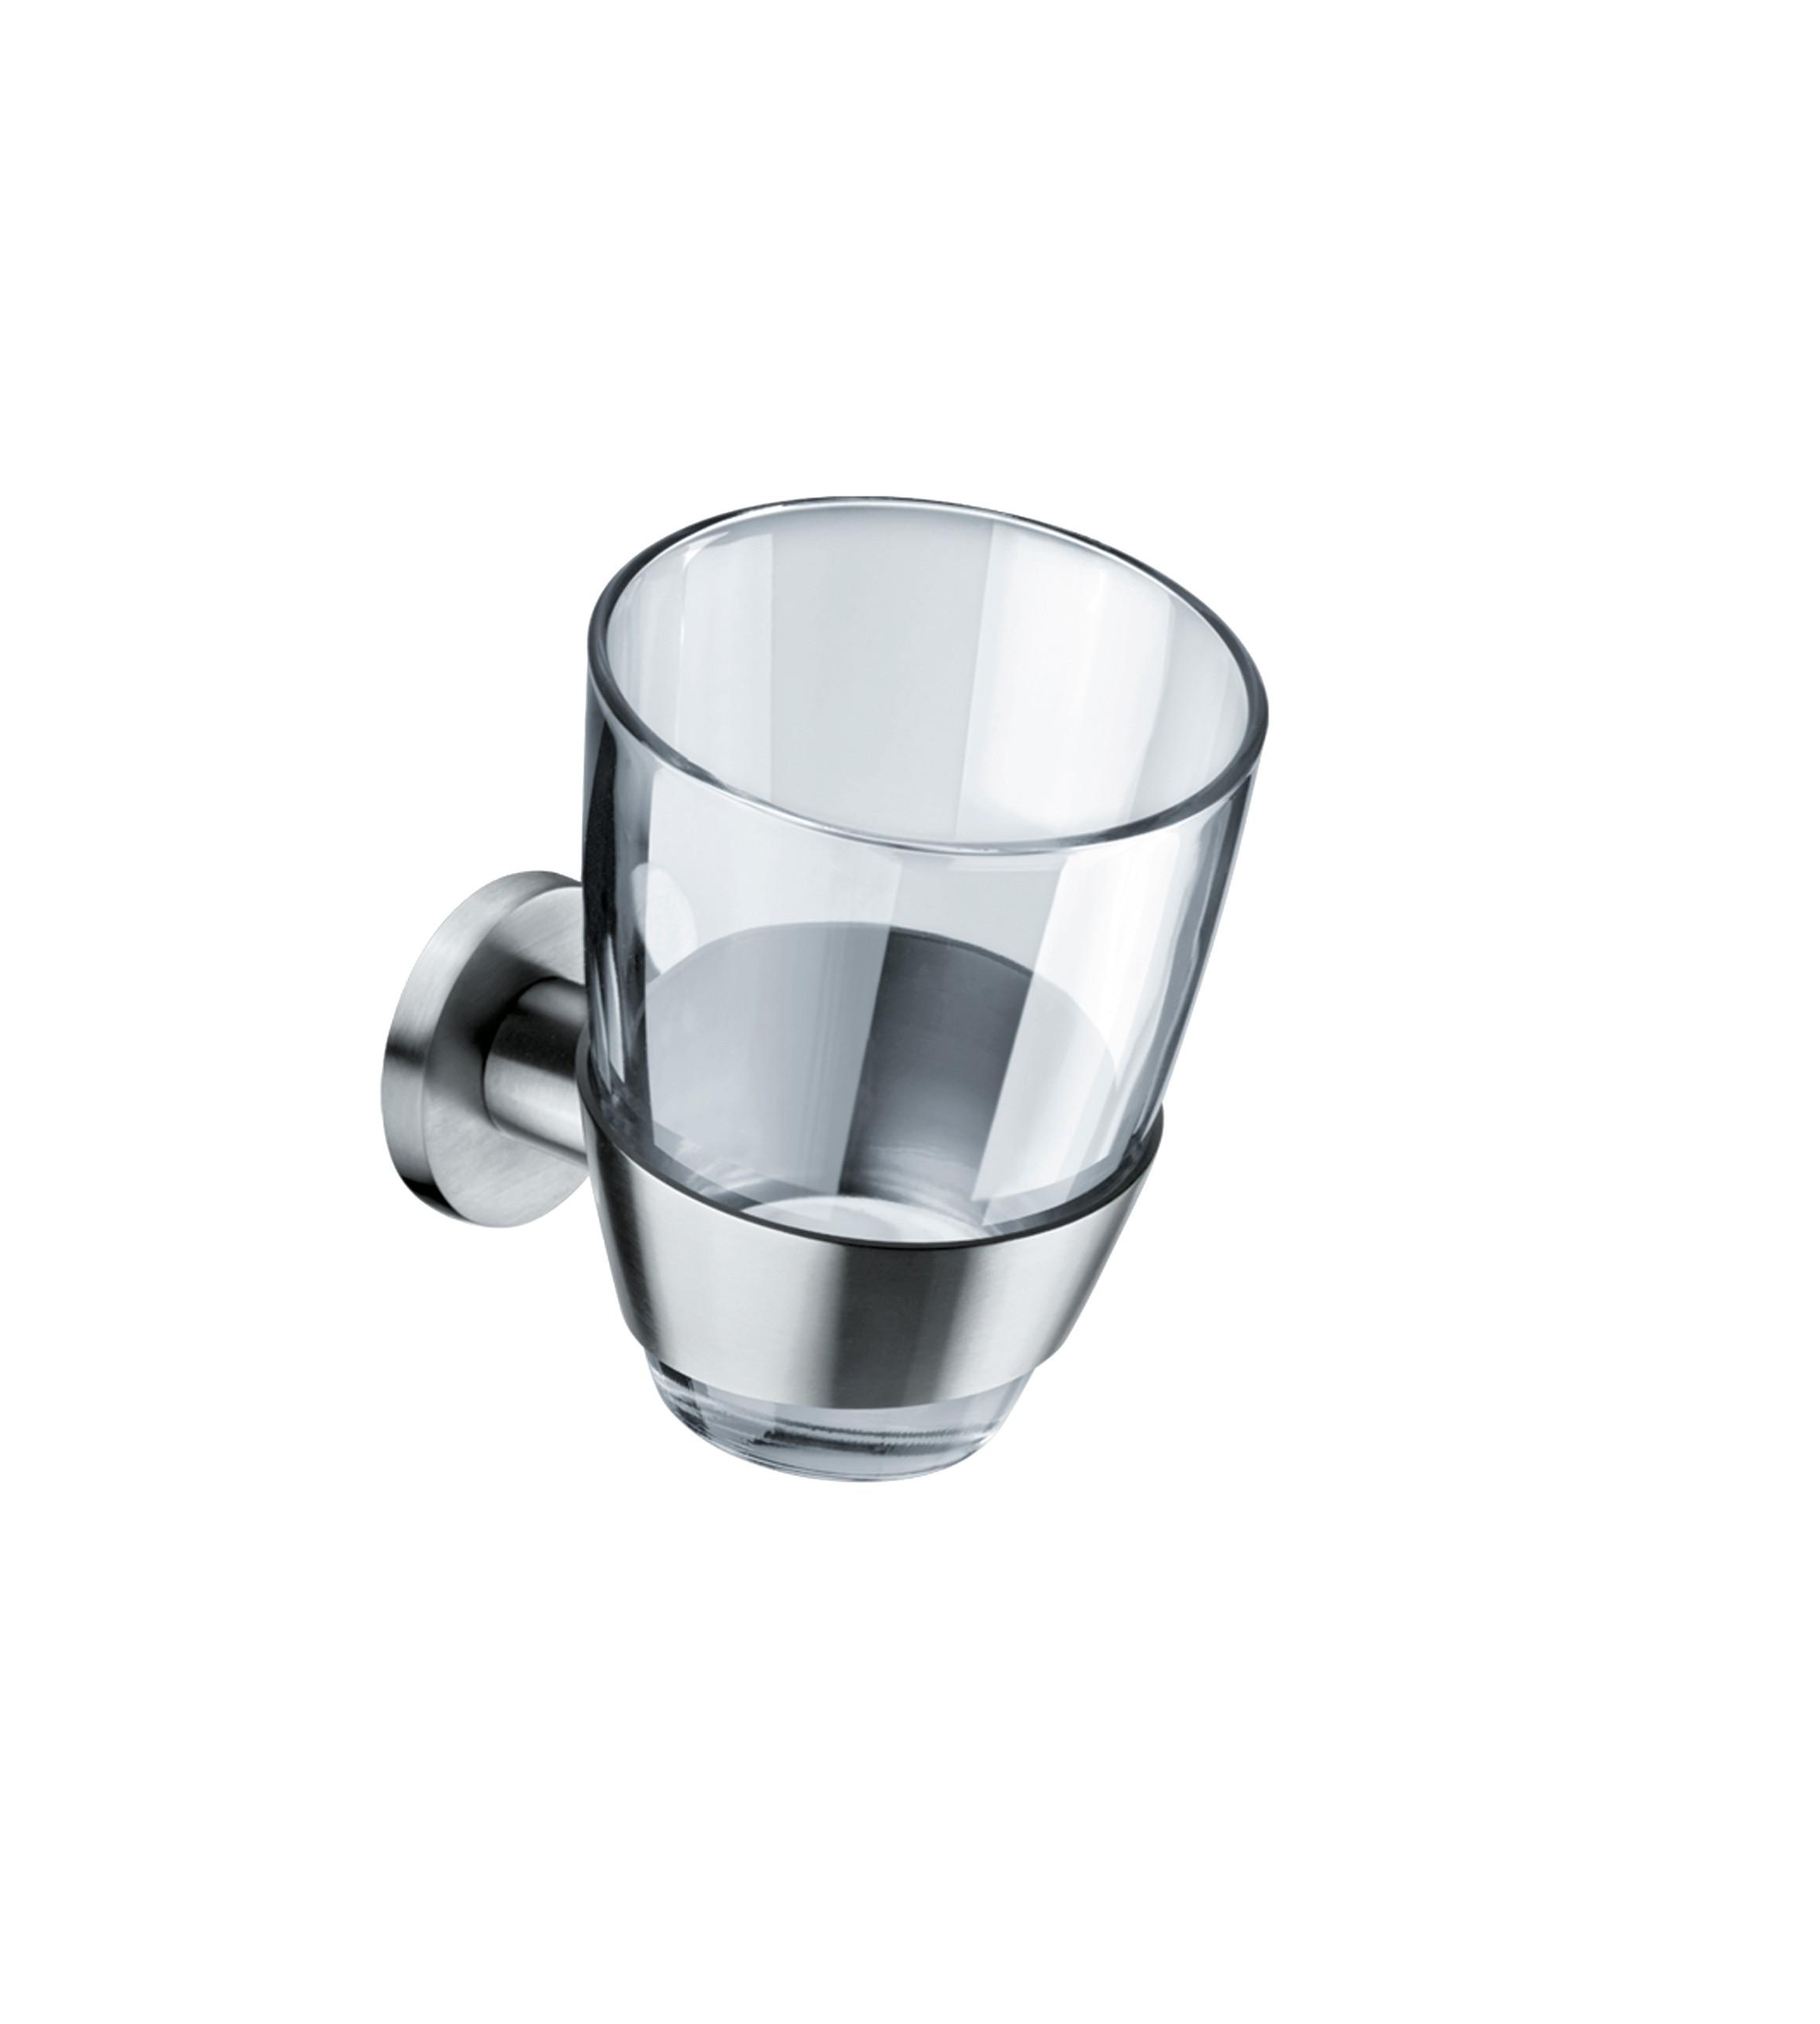 FSB Glashalter mit Glasbecher Glasbecher Metric Klebetechnik Edelstahl fein matt(0 82 8270 08041 6204)